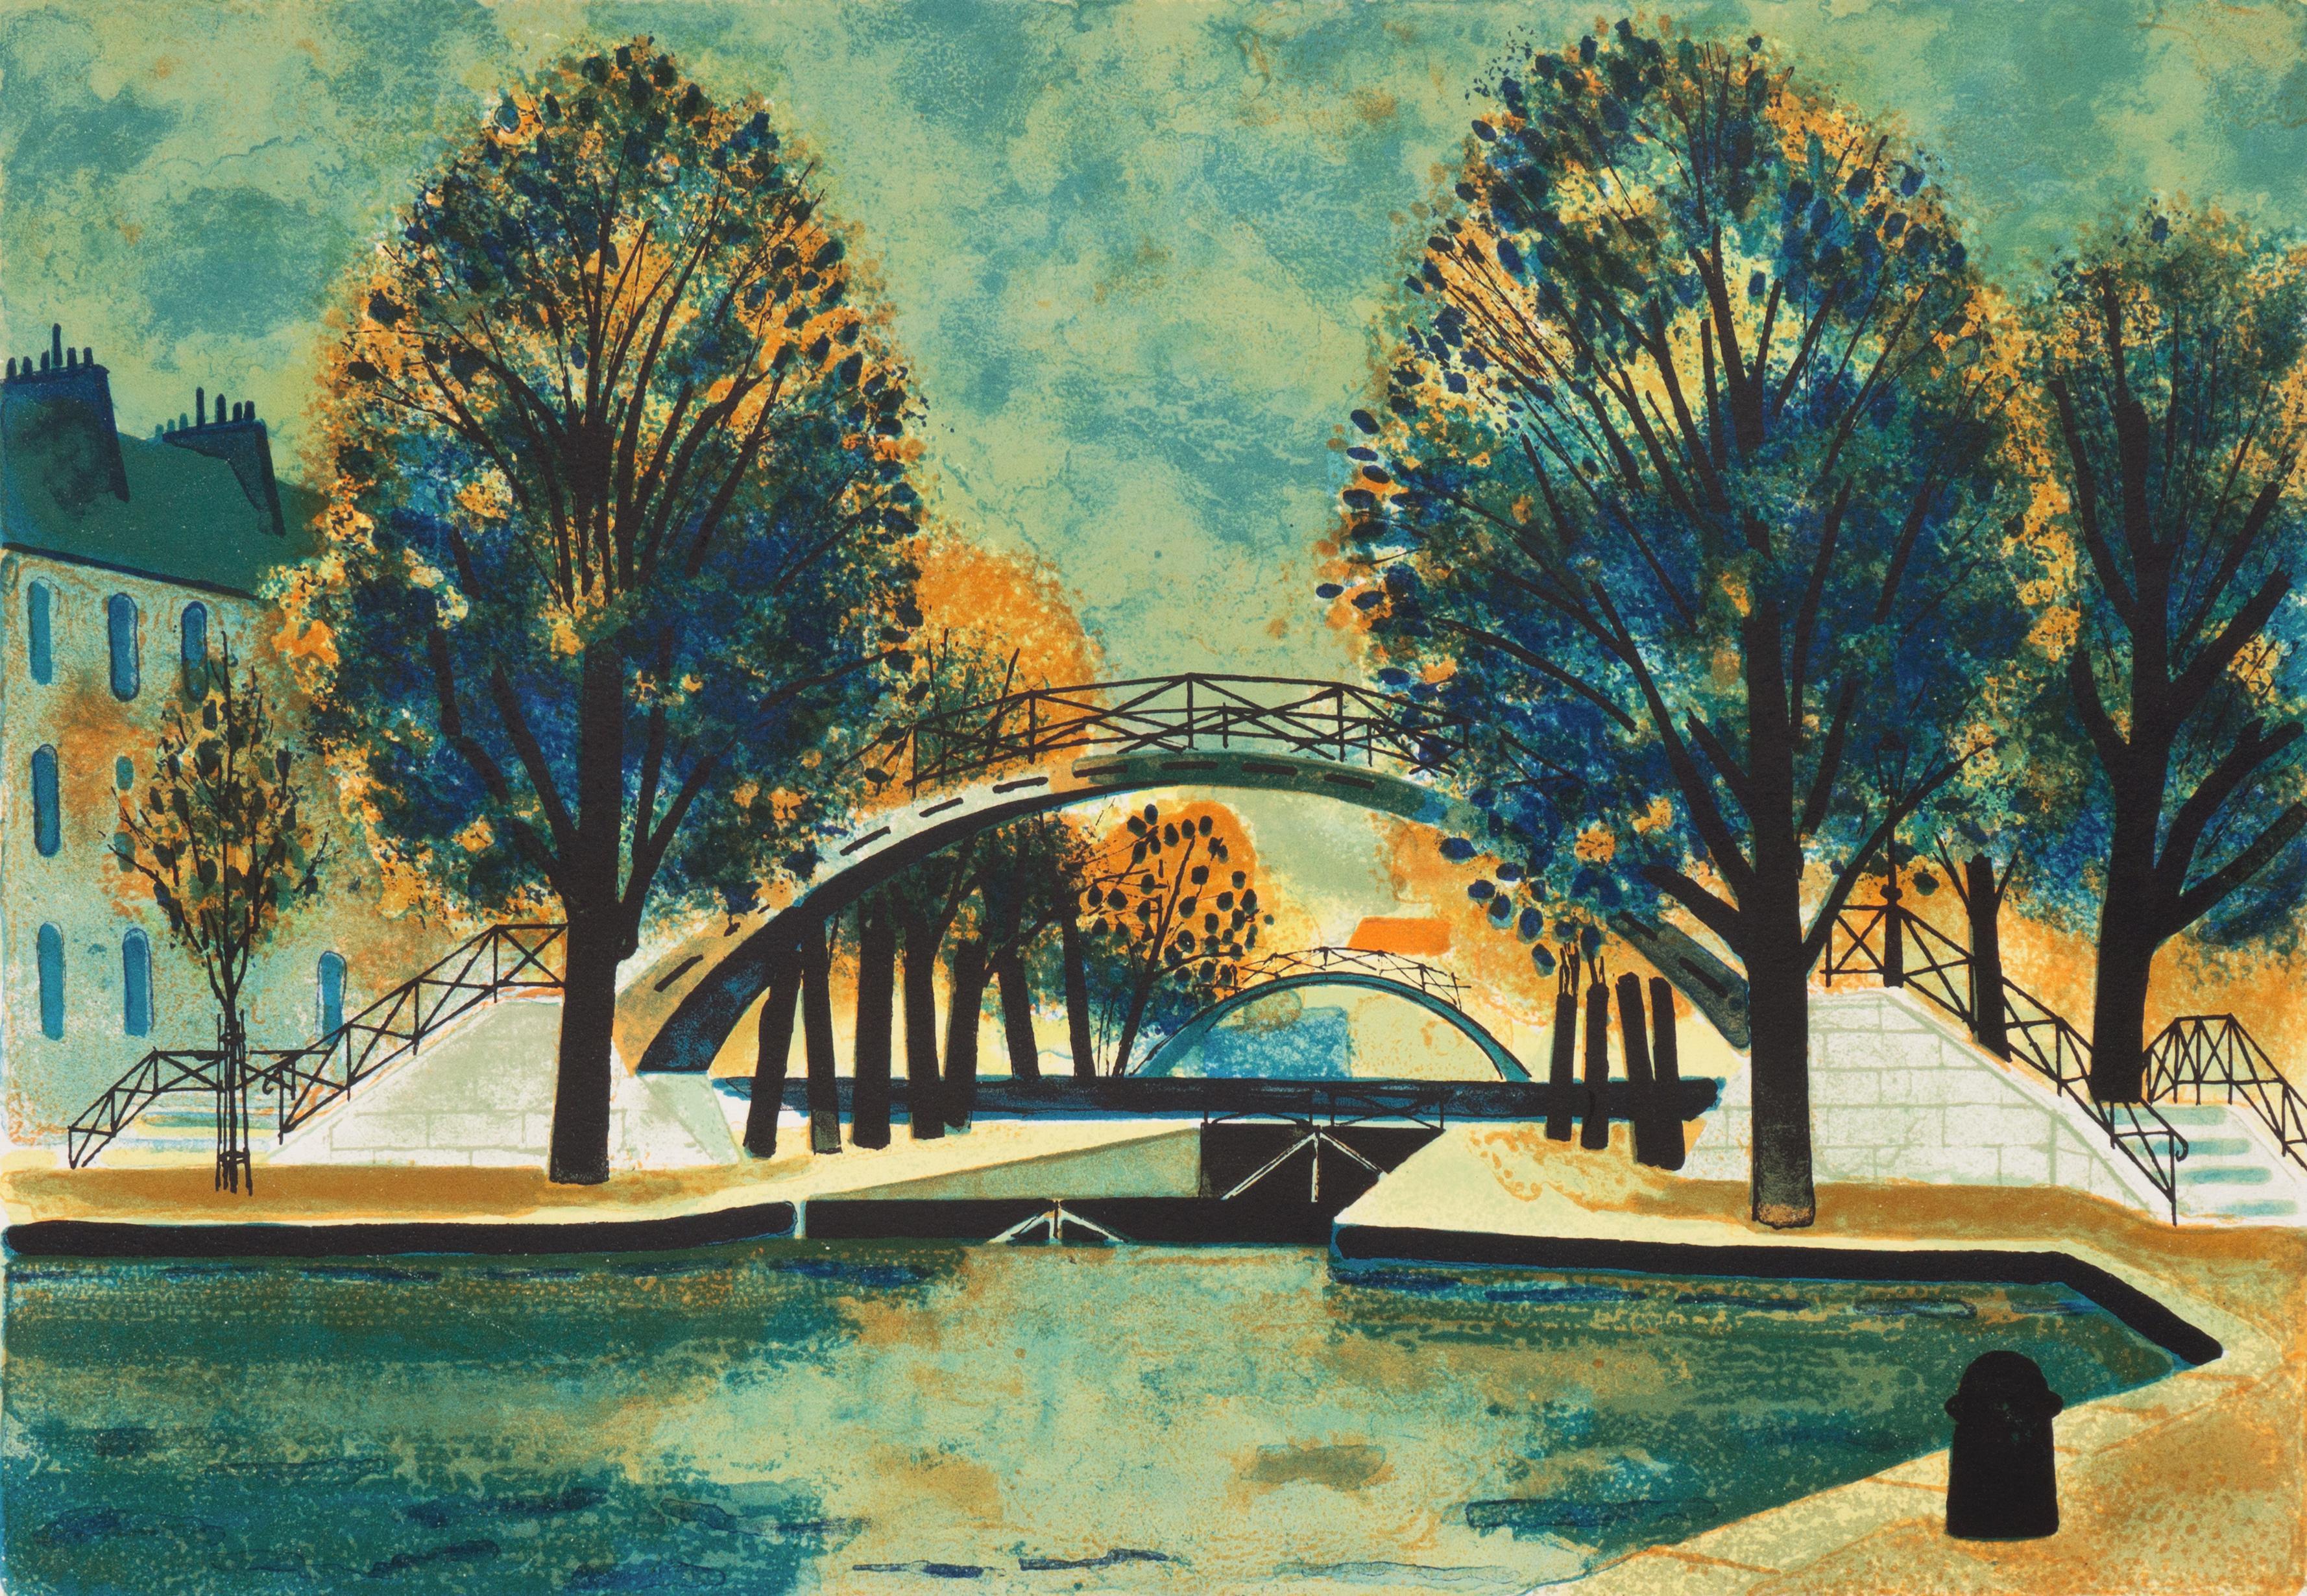 Post-Impressionist landscape, 'Canal Saint-Martin', School of Paris, Paris MOMA